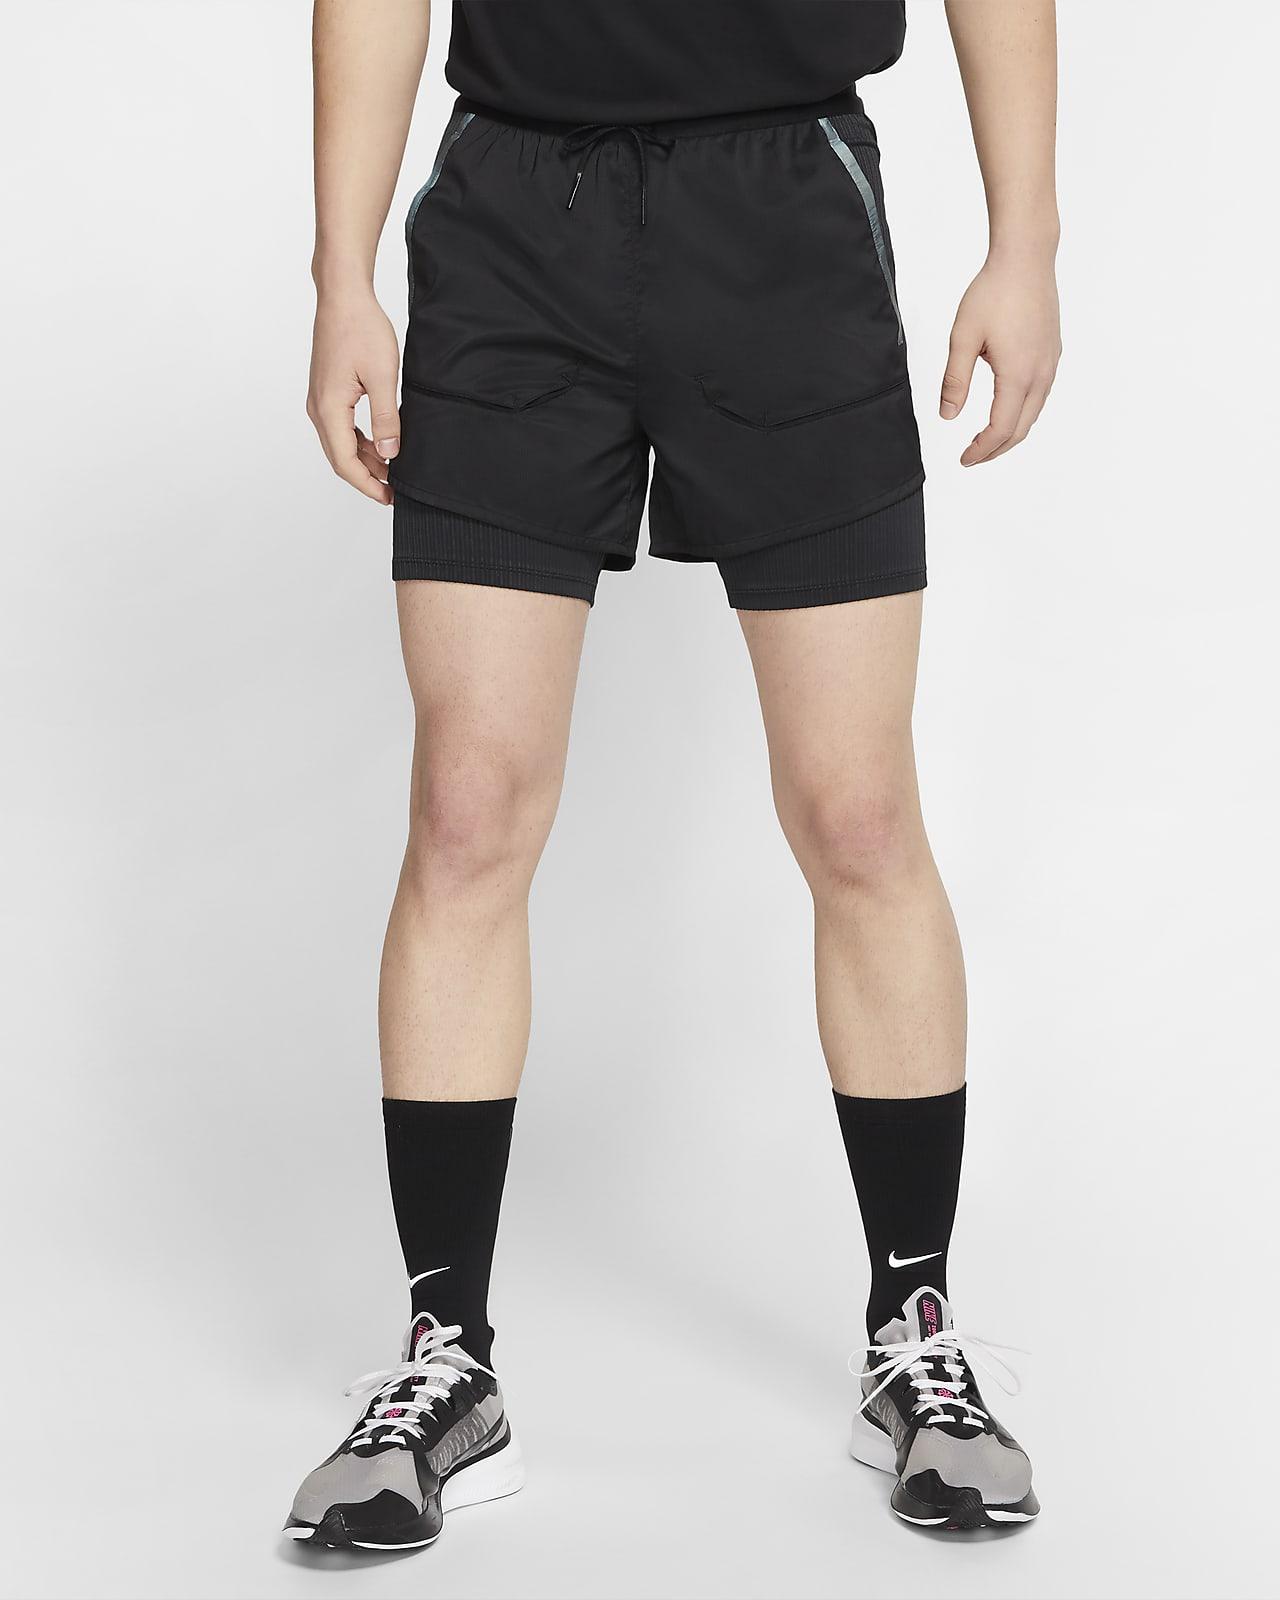 Nike Tech Pack 男款 2-In-1 跑步短褲